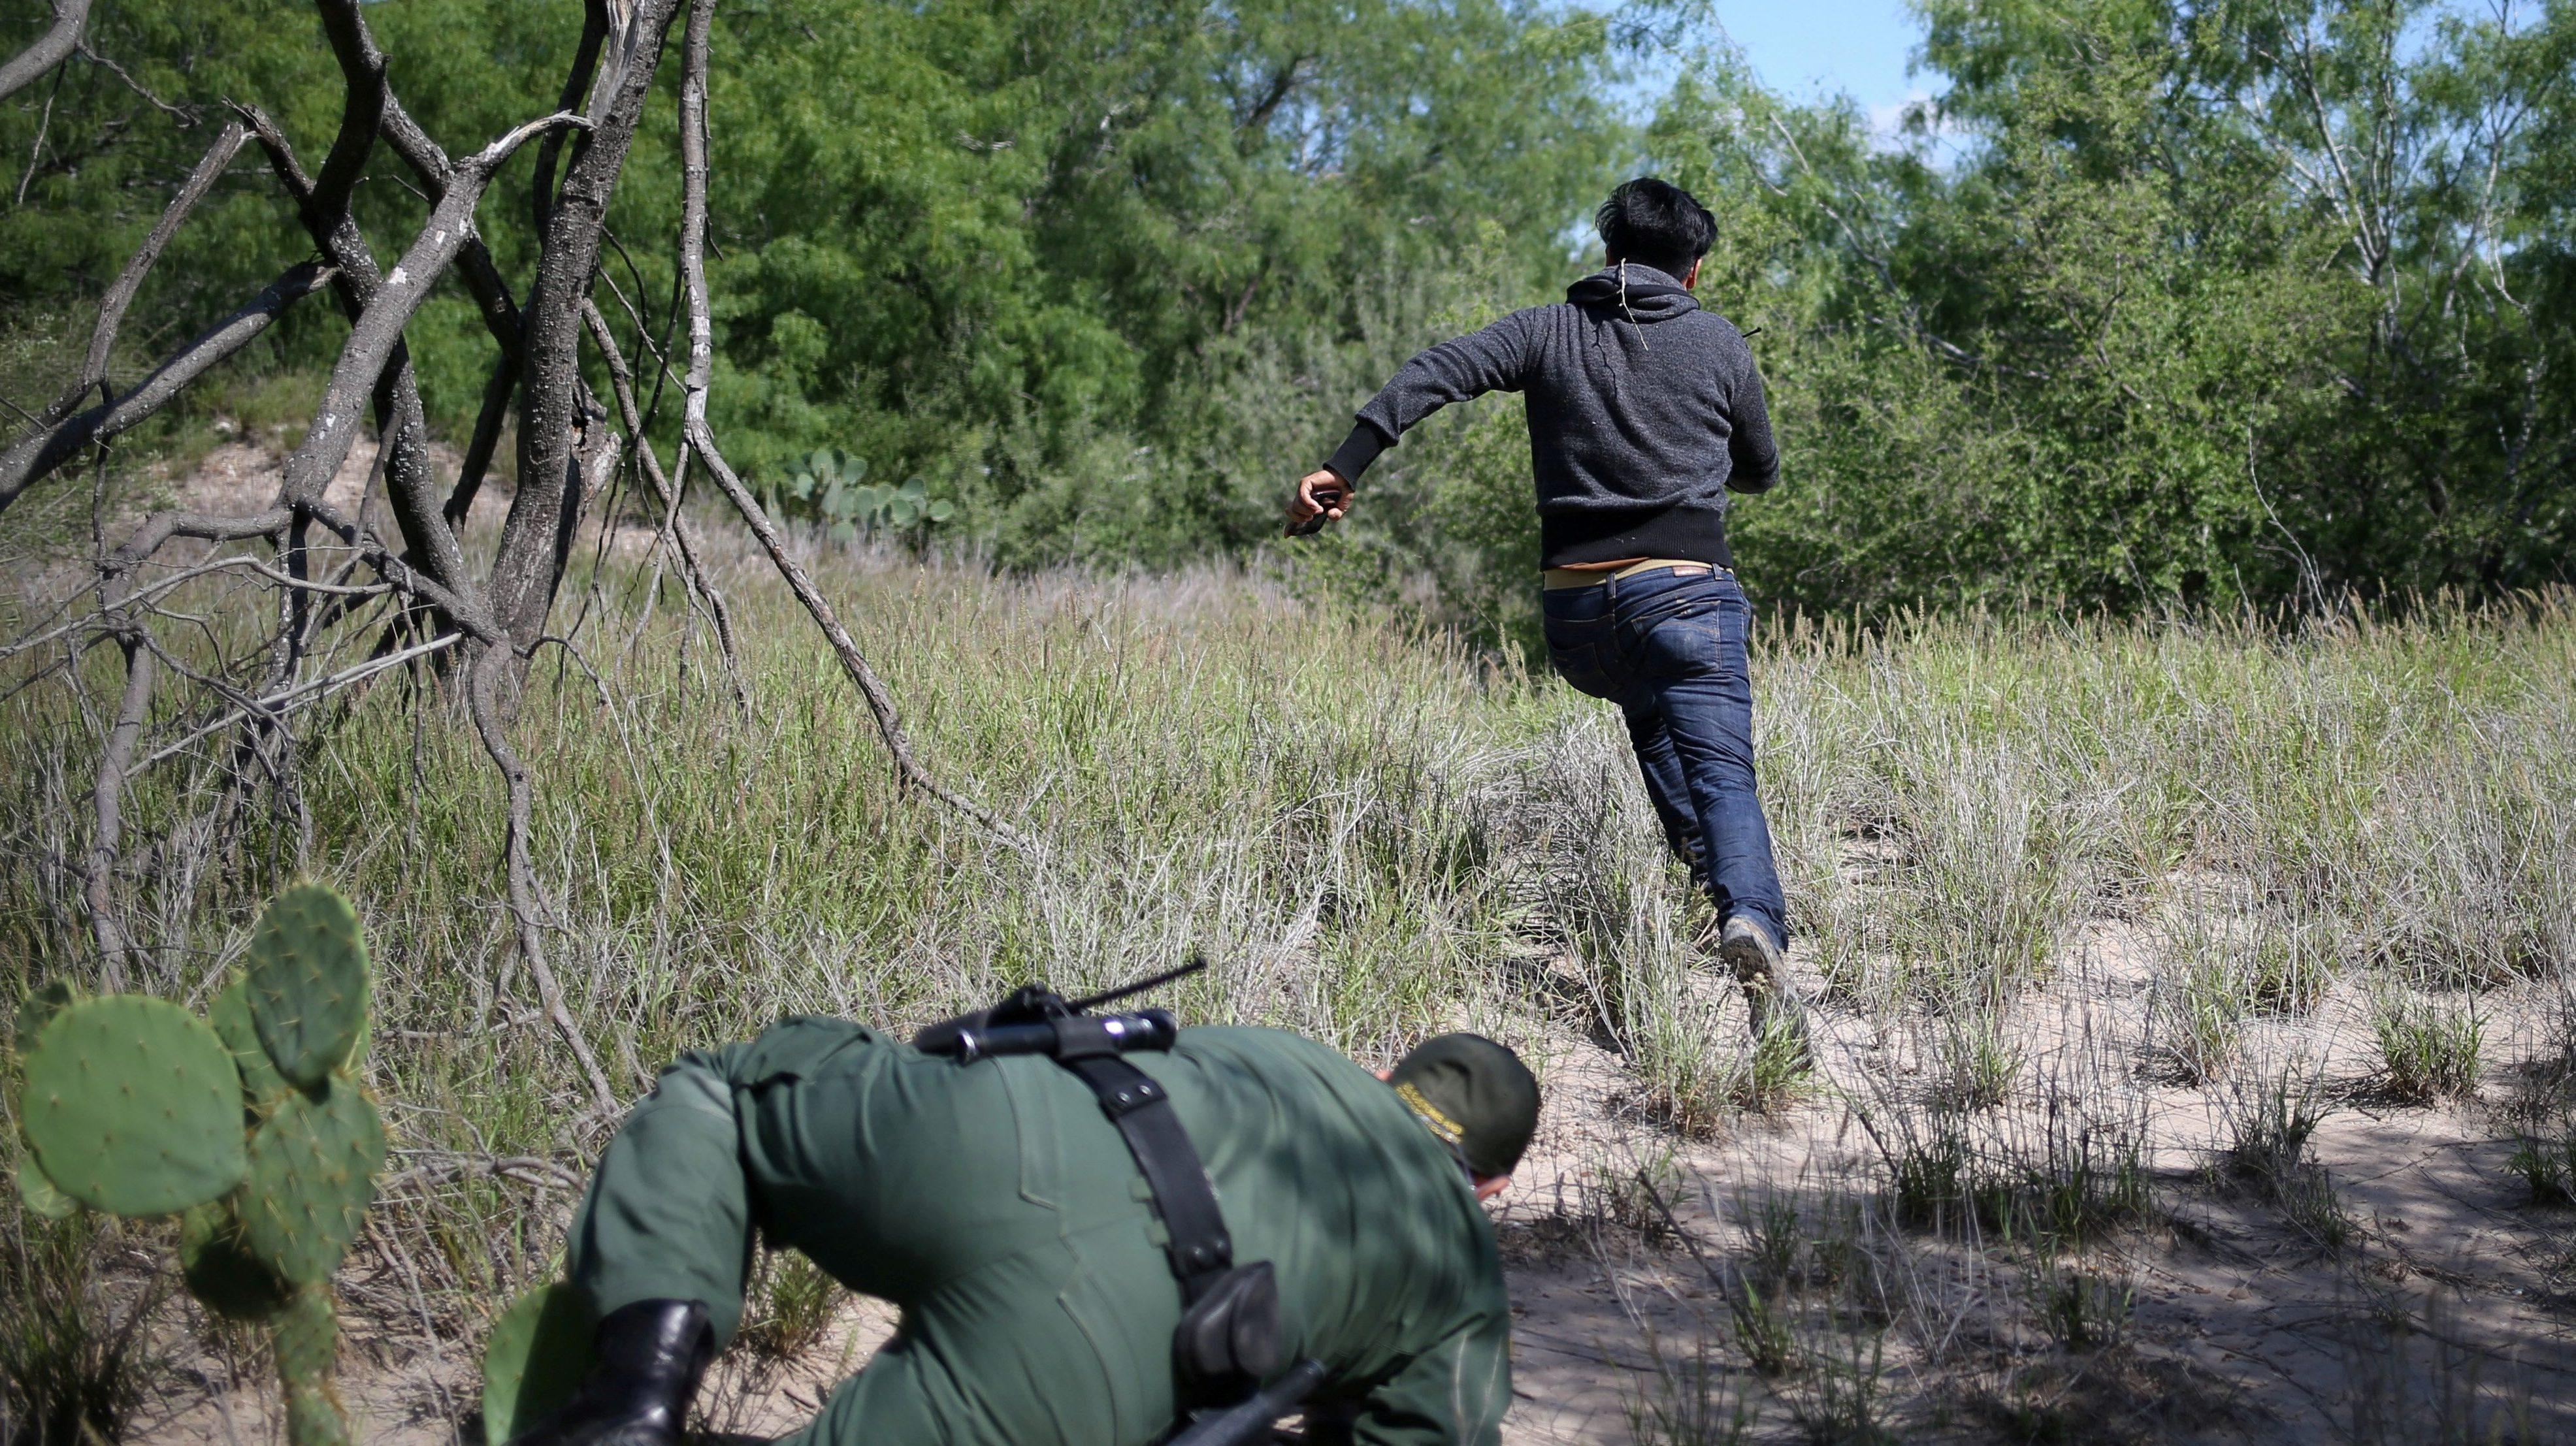 Will more hiring at US Border Patrol invite corruption? — Quartz